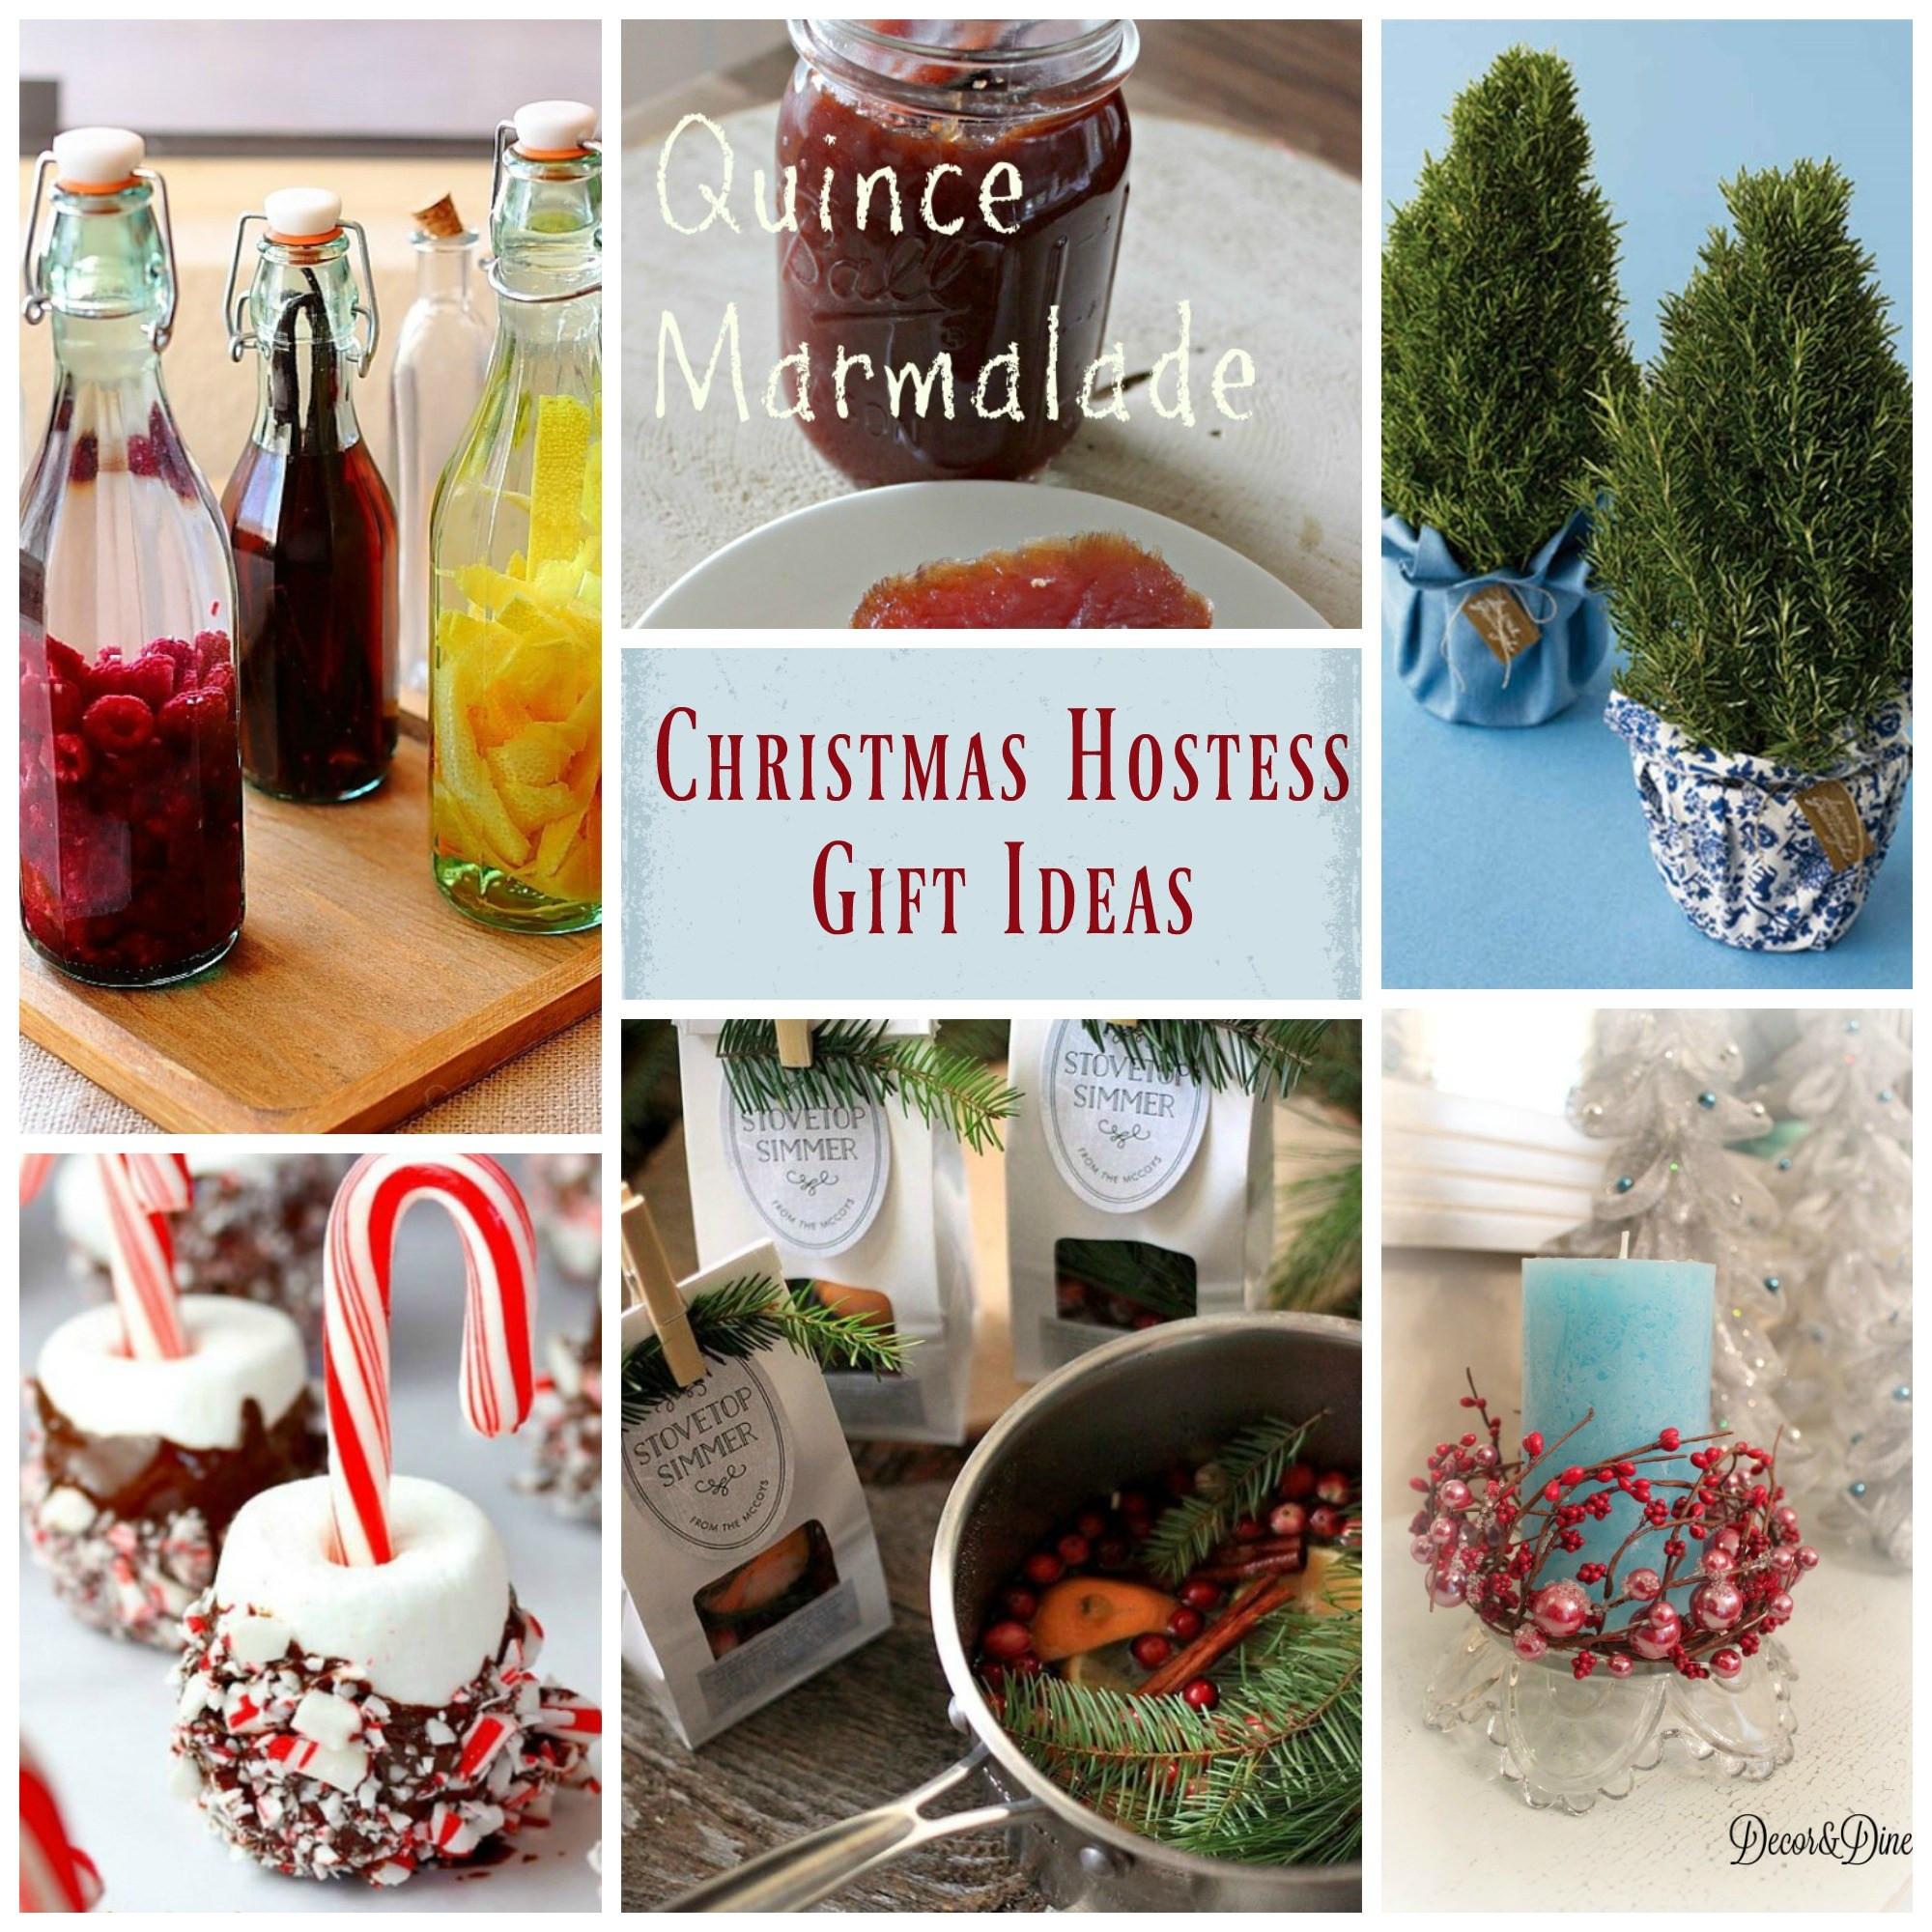 Christmas Hostess Gift Ideas  Christmas Hostess Gift Ideas